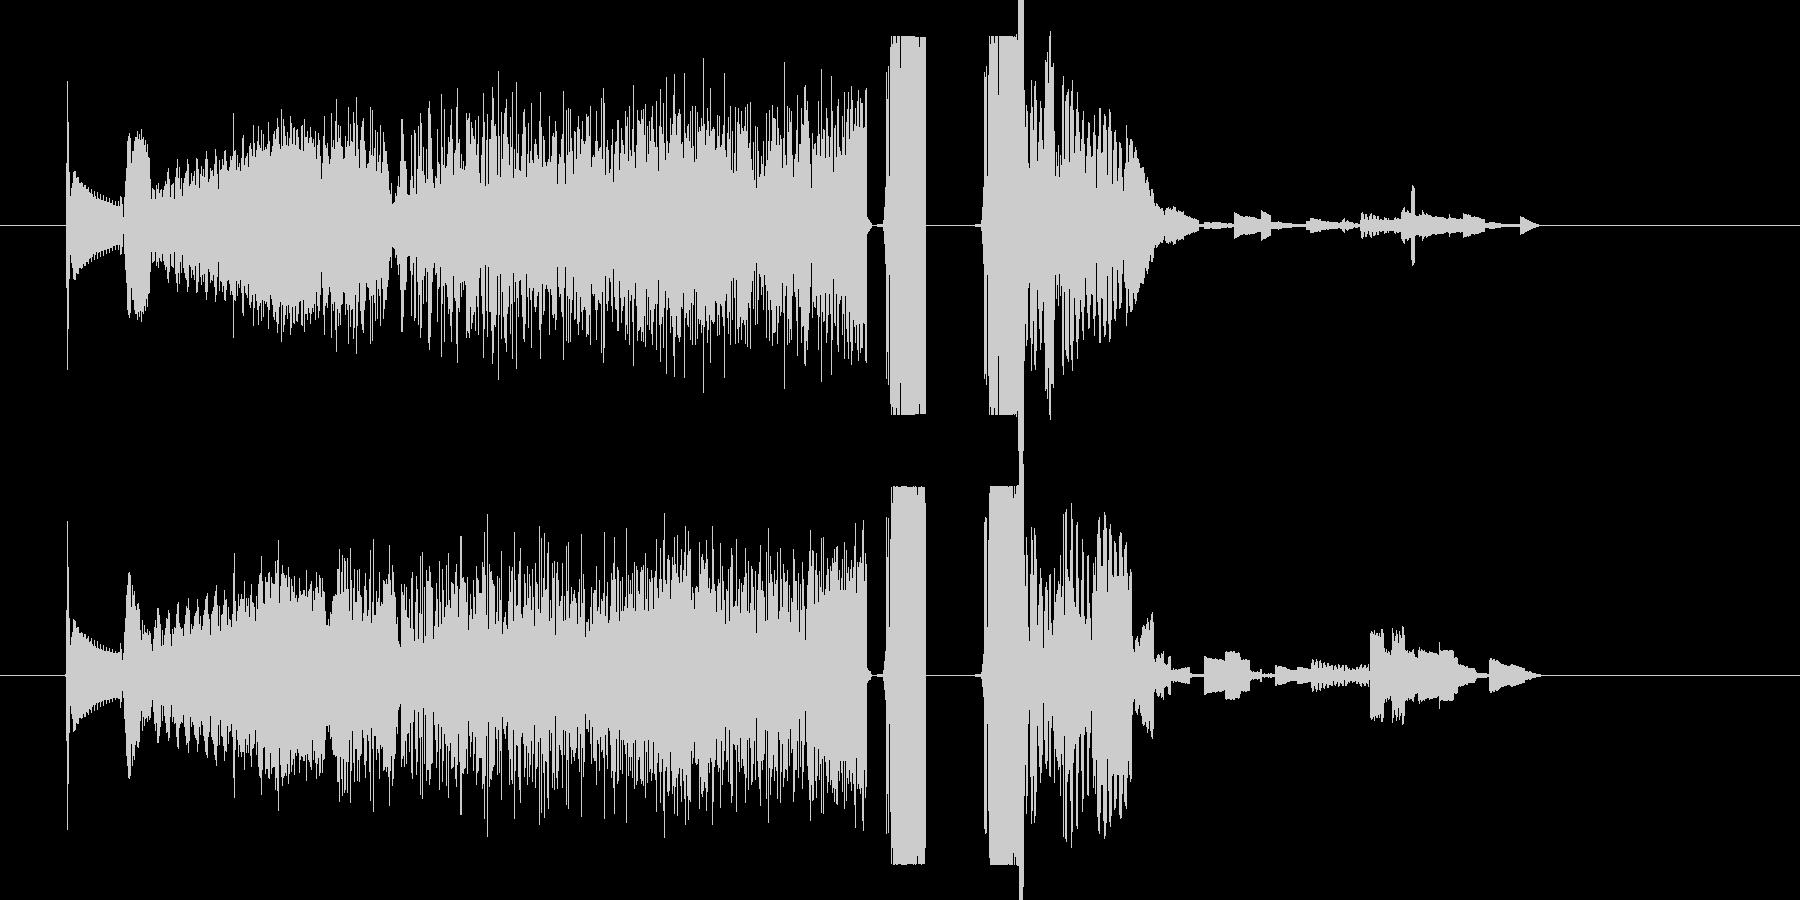 FMジングル 海外ラジオ風 DJ 効果音の未再生の波形